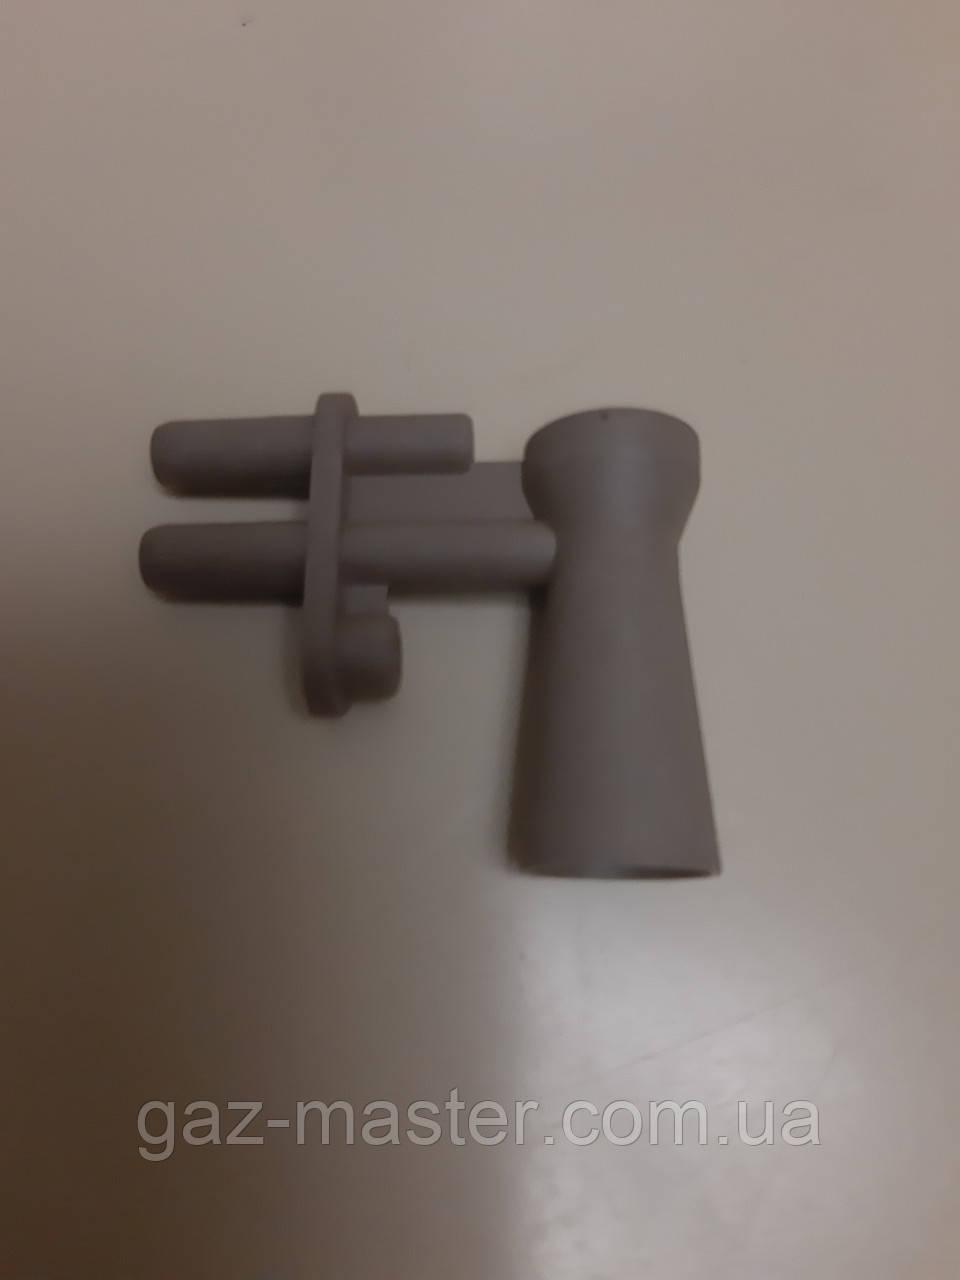 Трубка пито вентилятора Vaillant Turbomax | TurboTec 094282